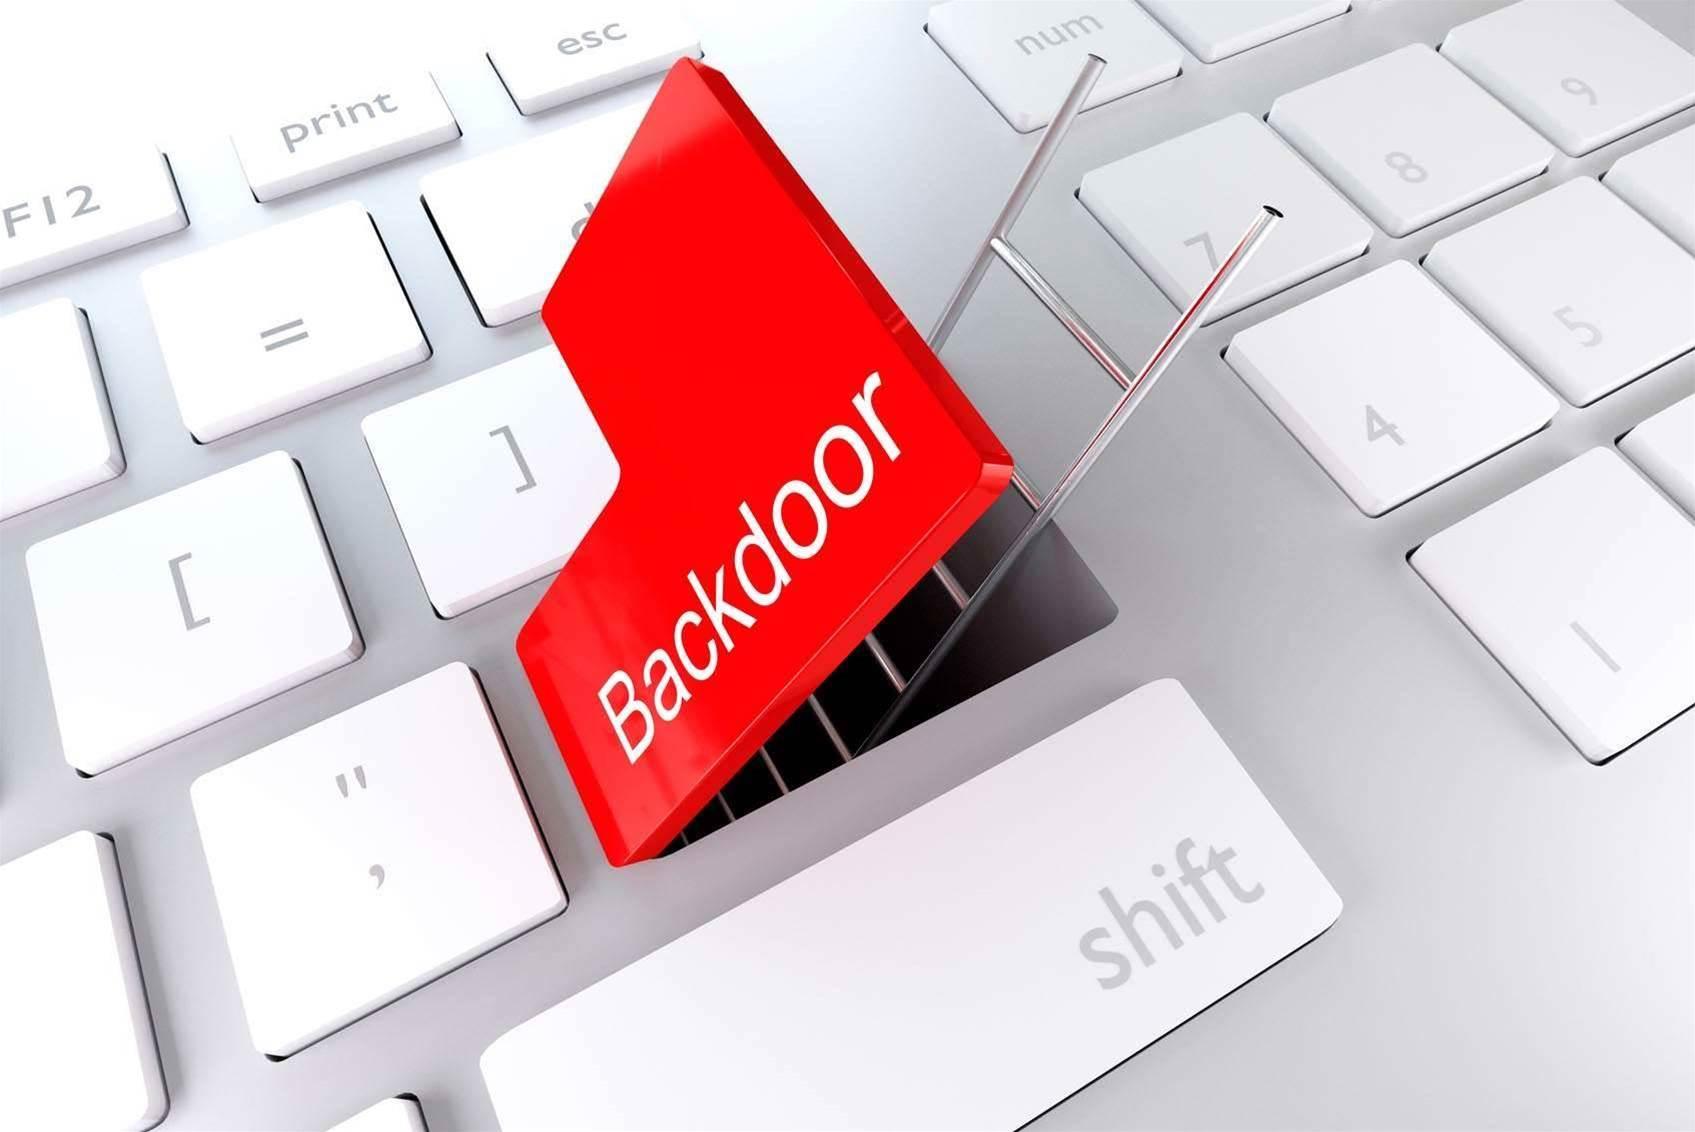 Lenovo hunts BIOS backdoor bandits